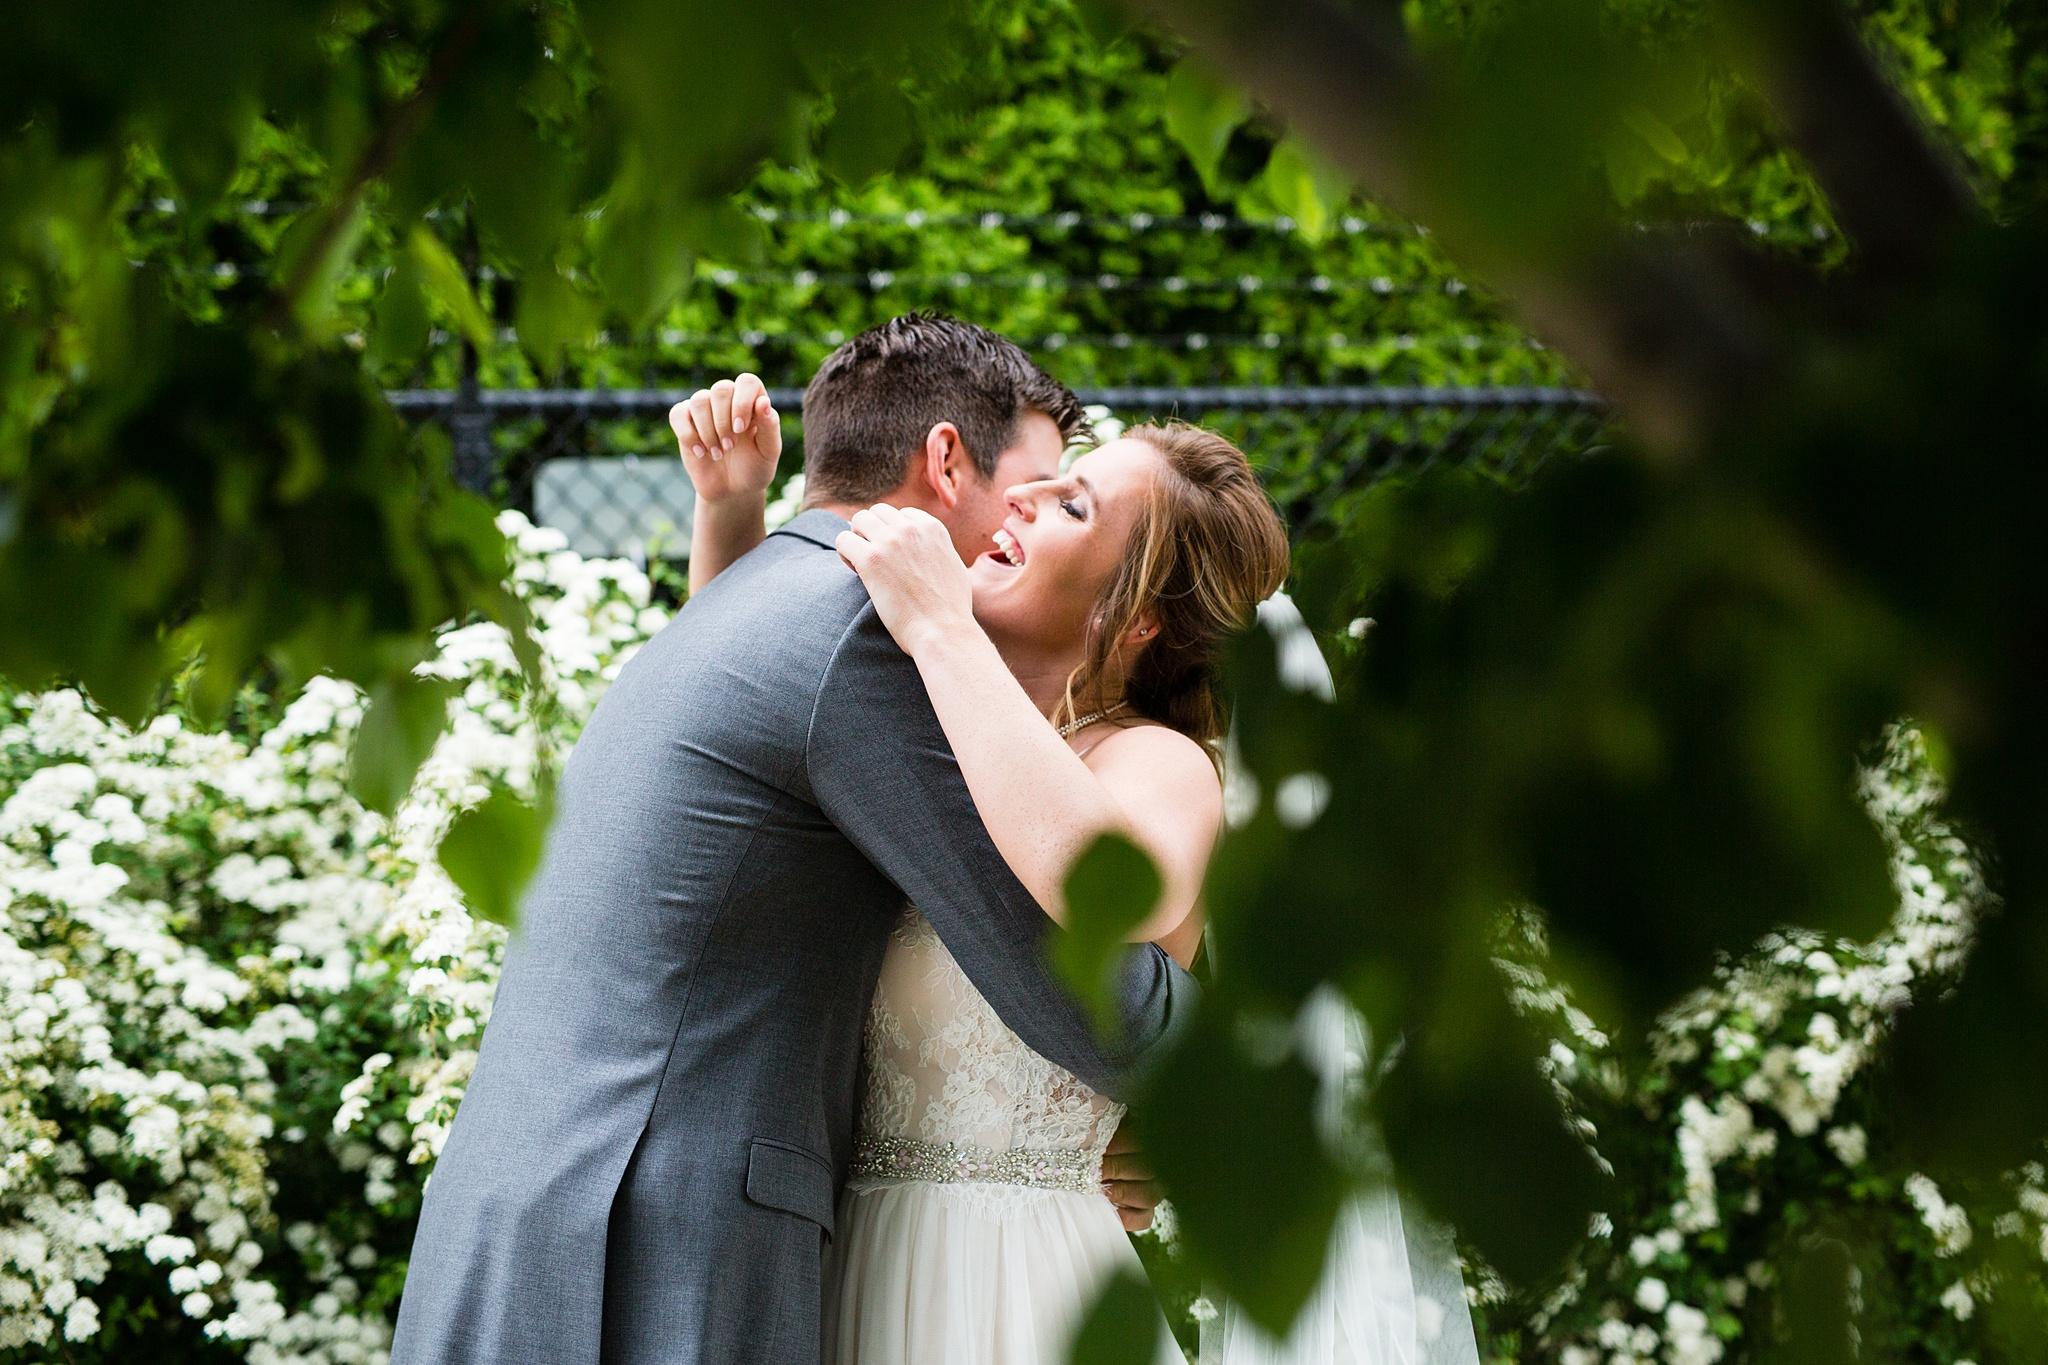 Meghan_Drew_Grand_Rapids_Cheney_place_Wedding026.JPG